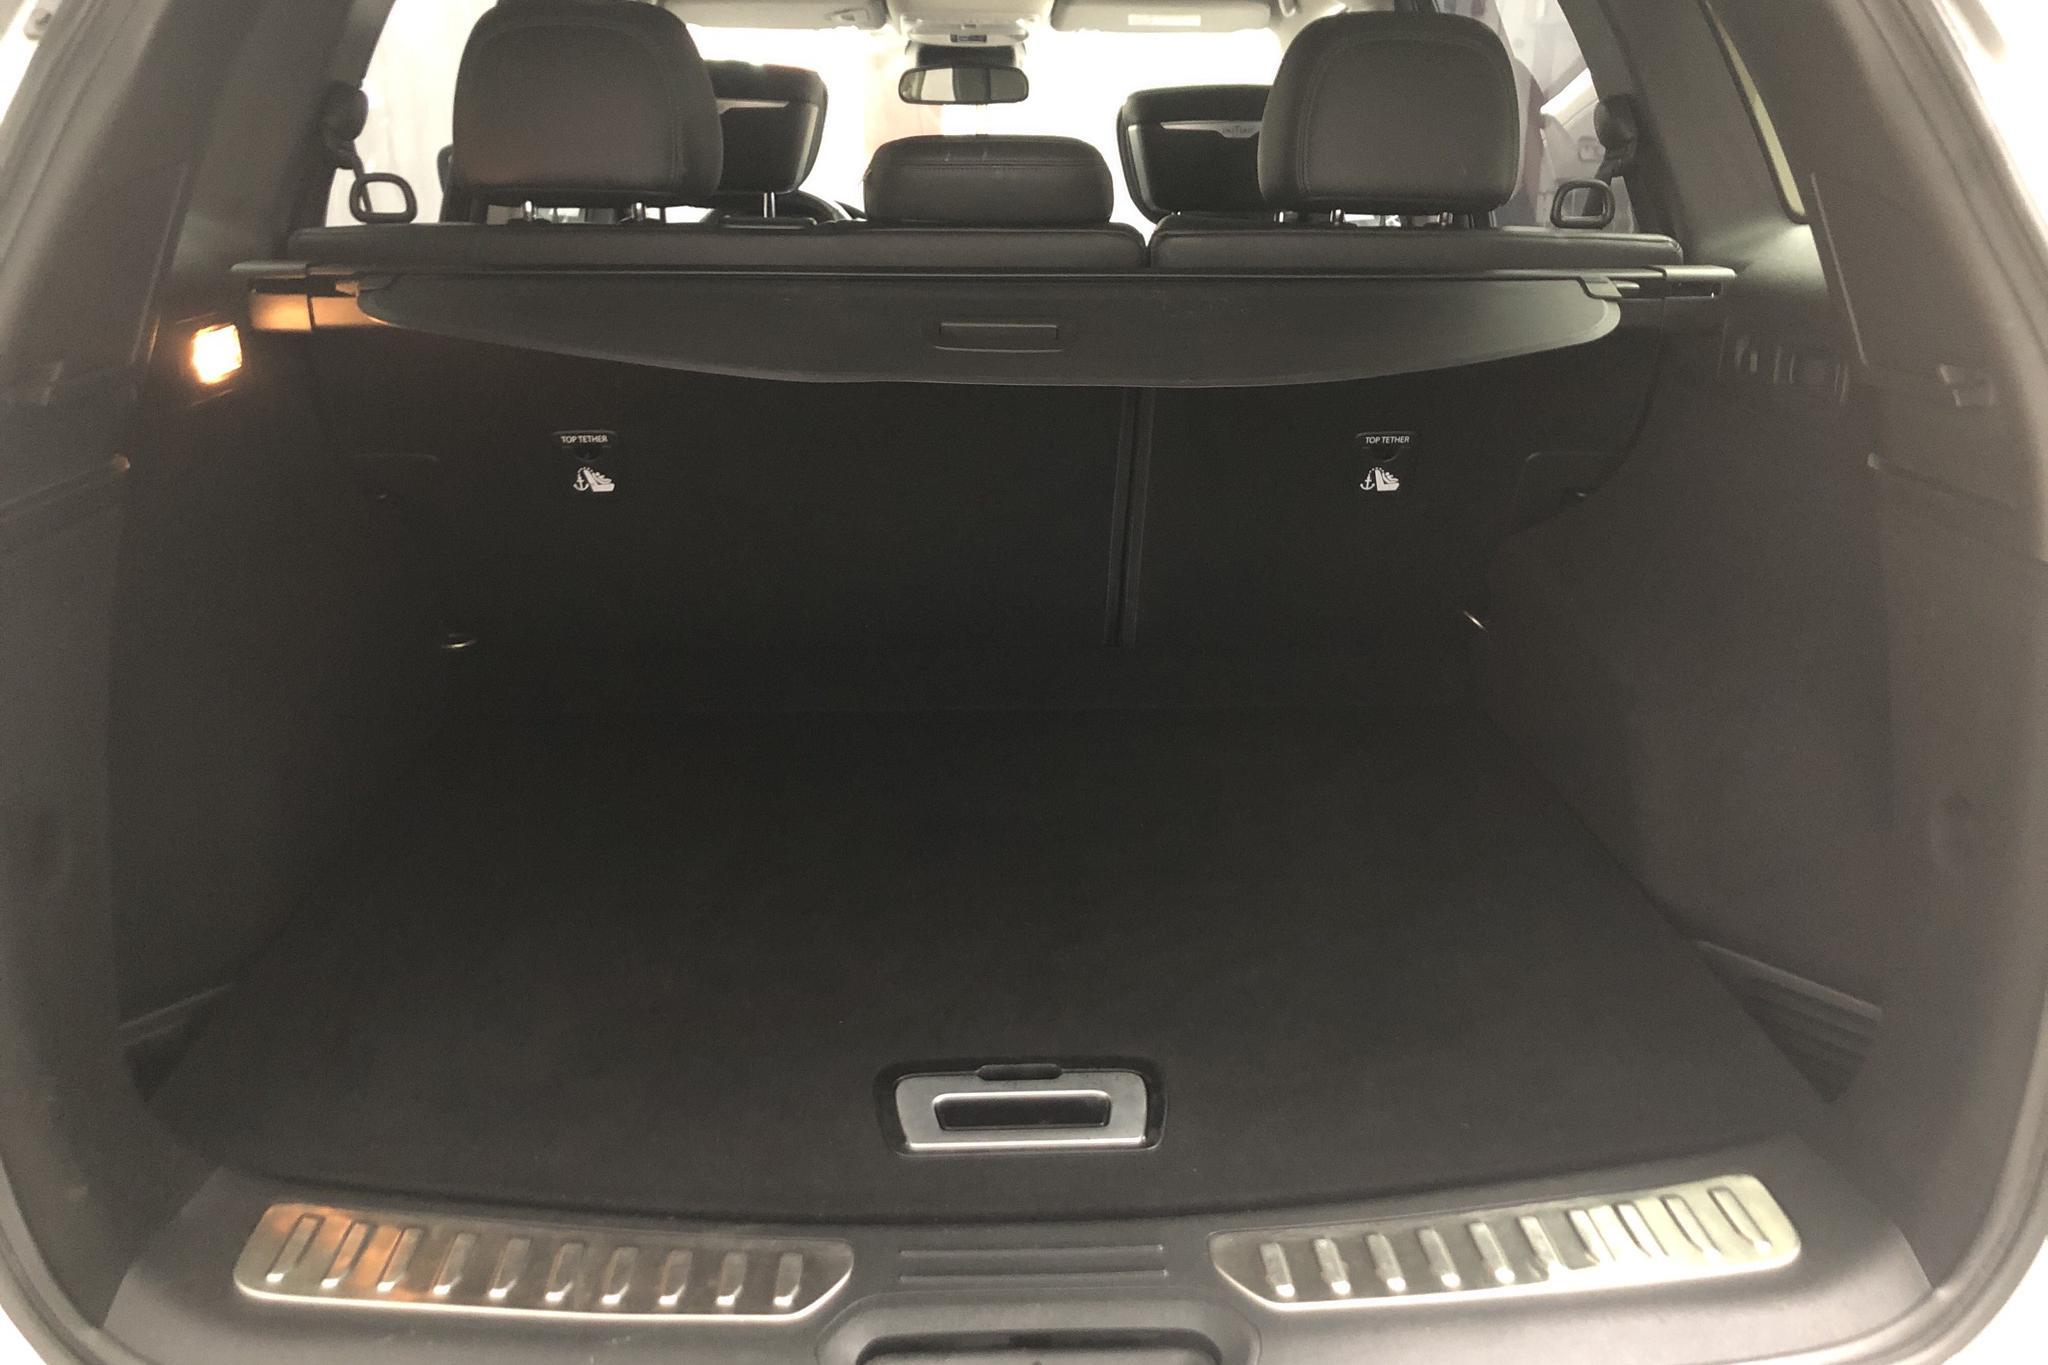 Renault Koleos 2.0 dCi 4X4 (177hk) - 7 634 mil - Automat - Light Grey - 2017